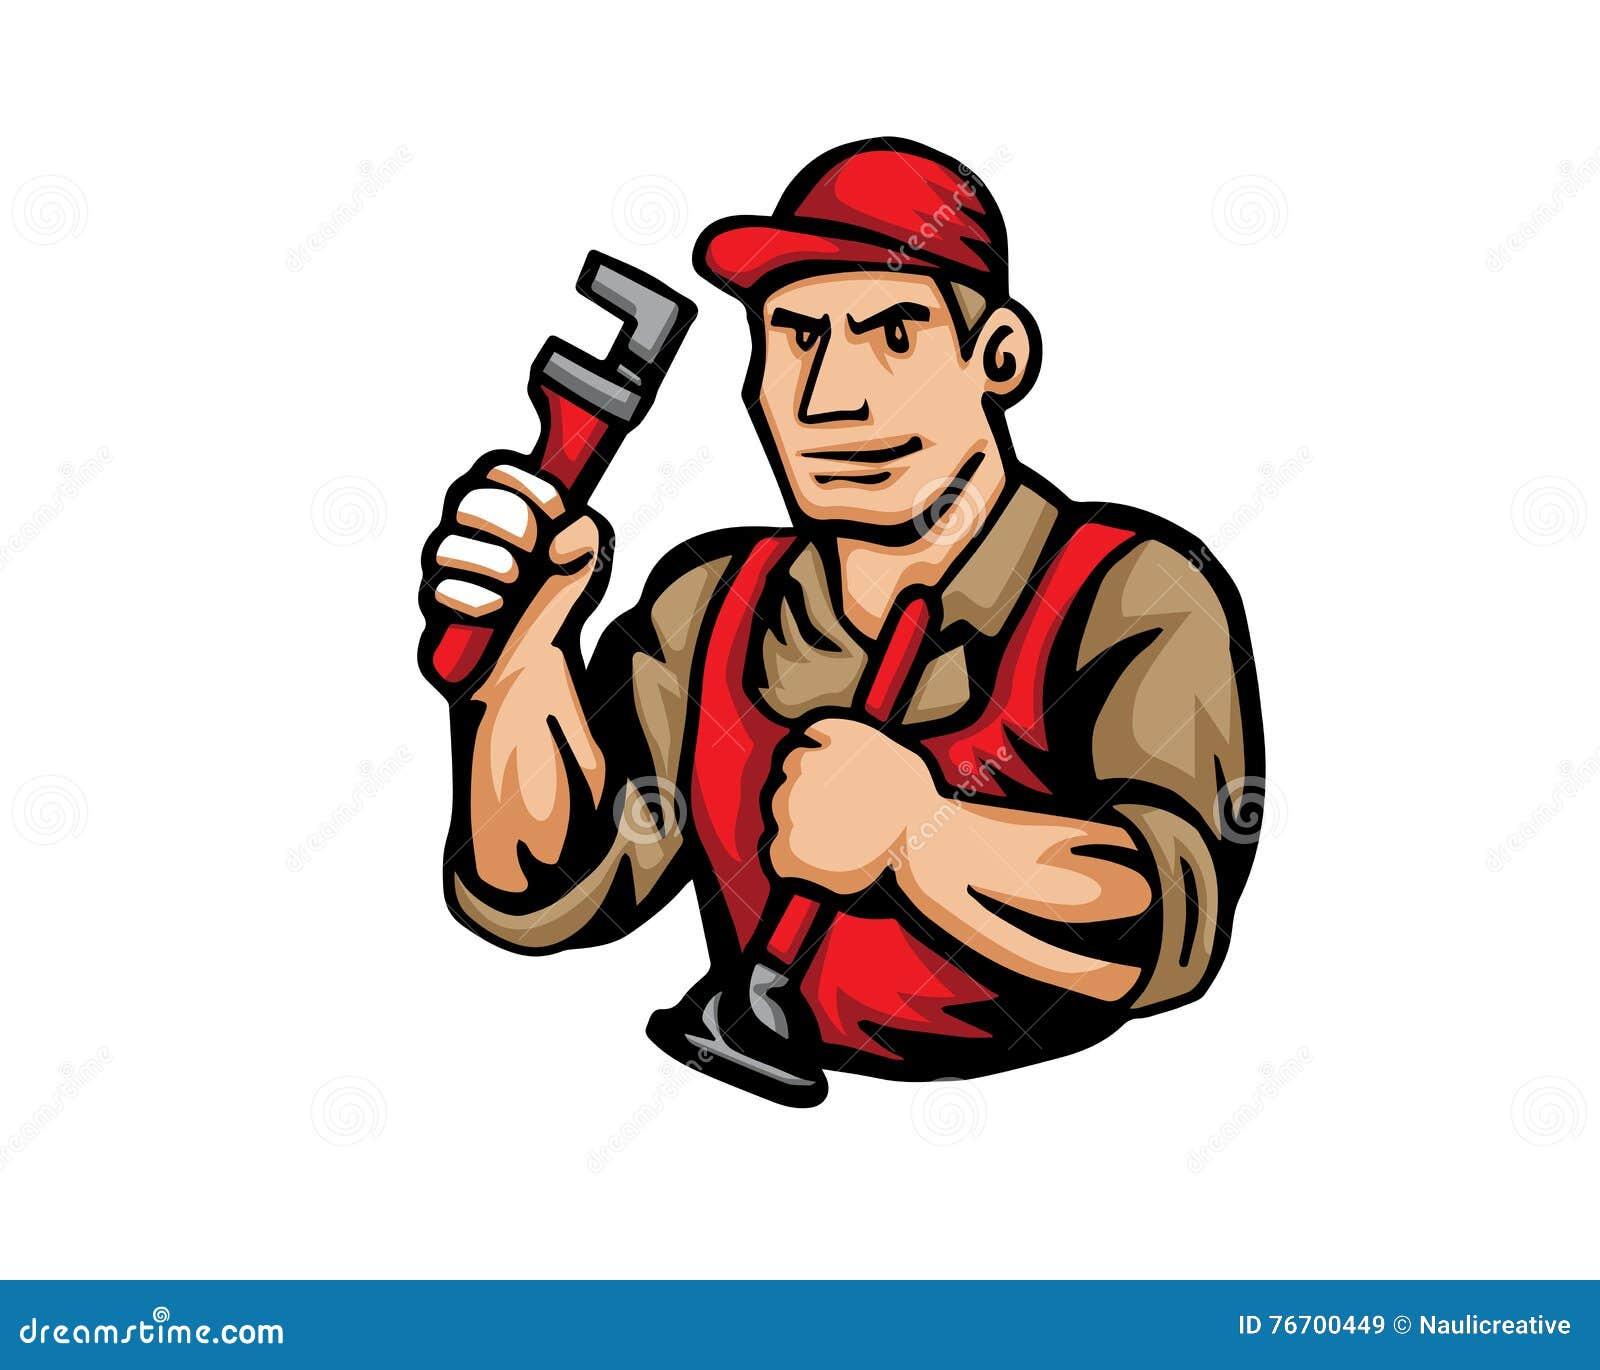 modern-occupation-people-cartoon-logo-plumber-76700449.jpg